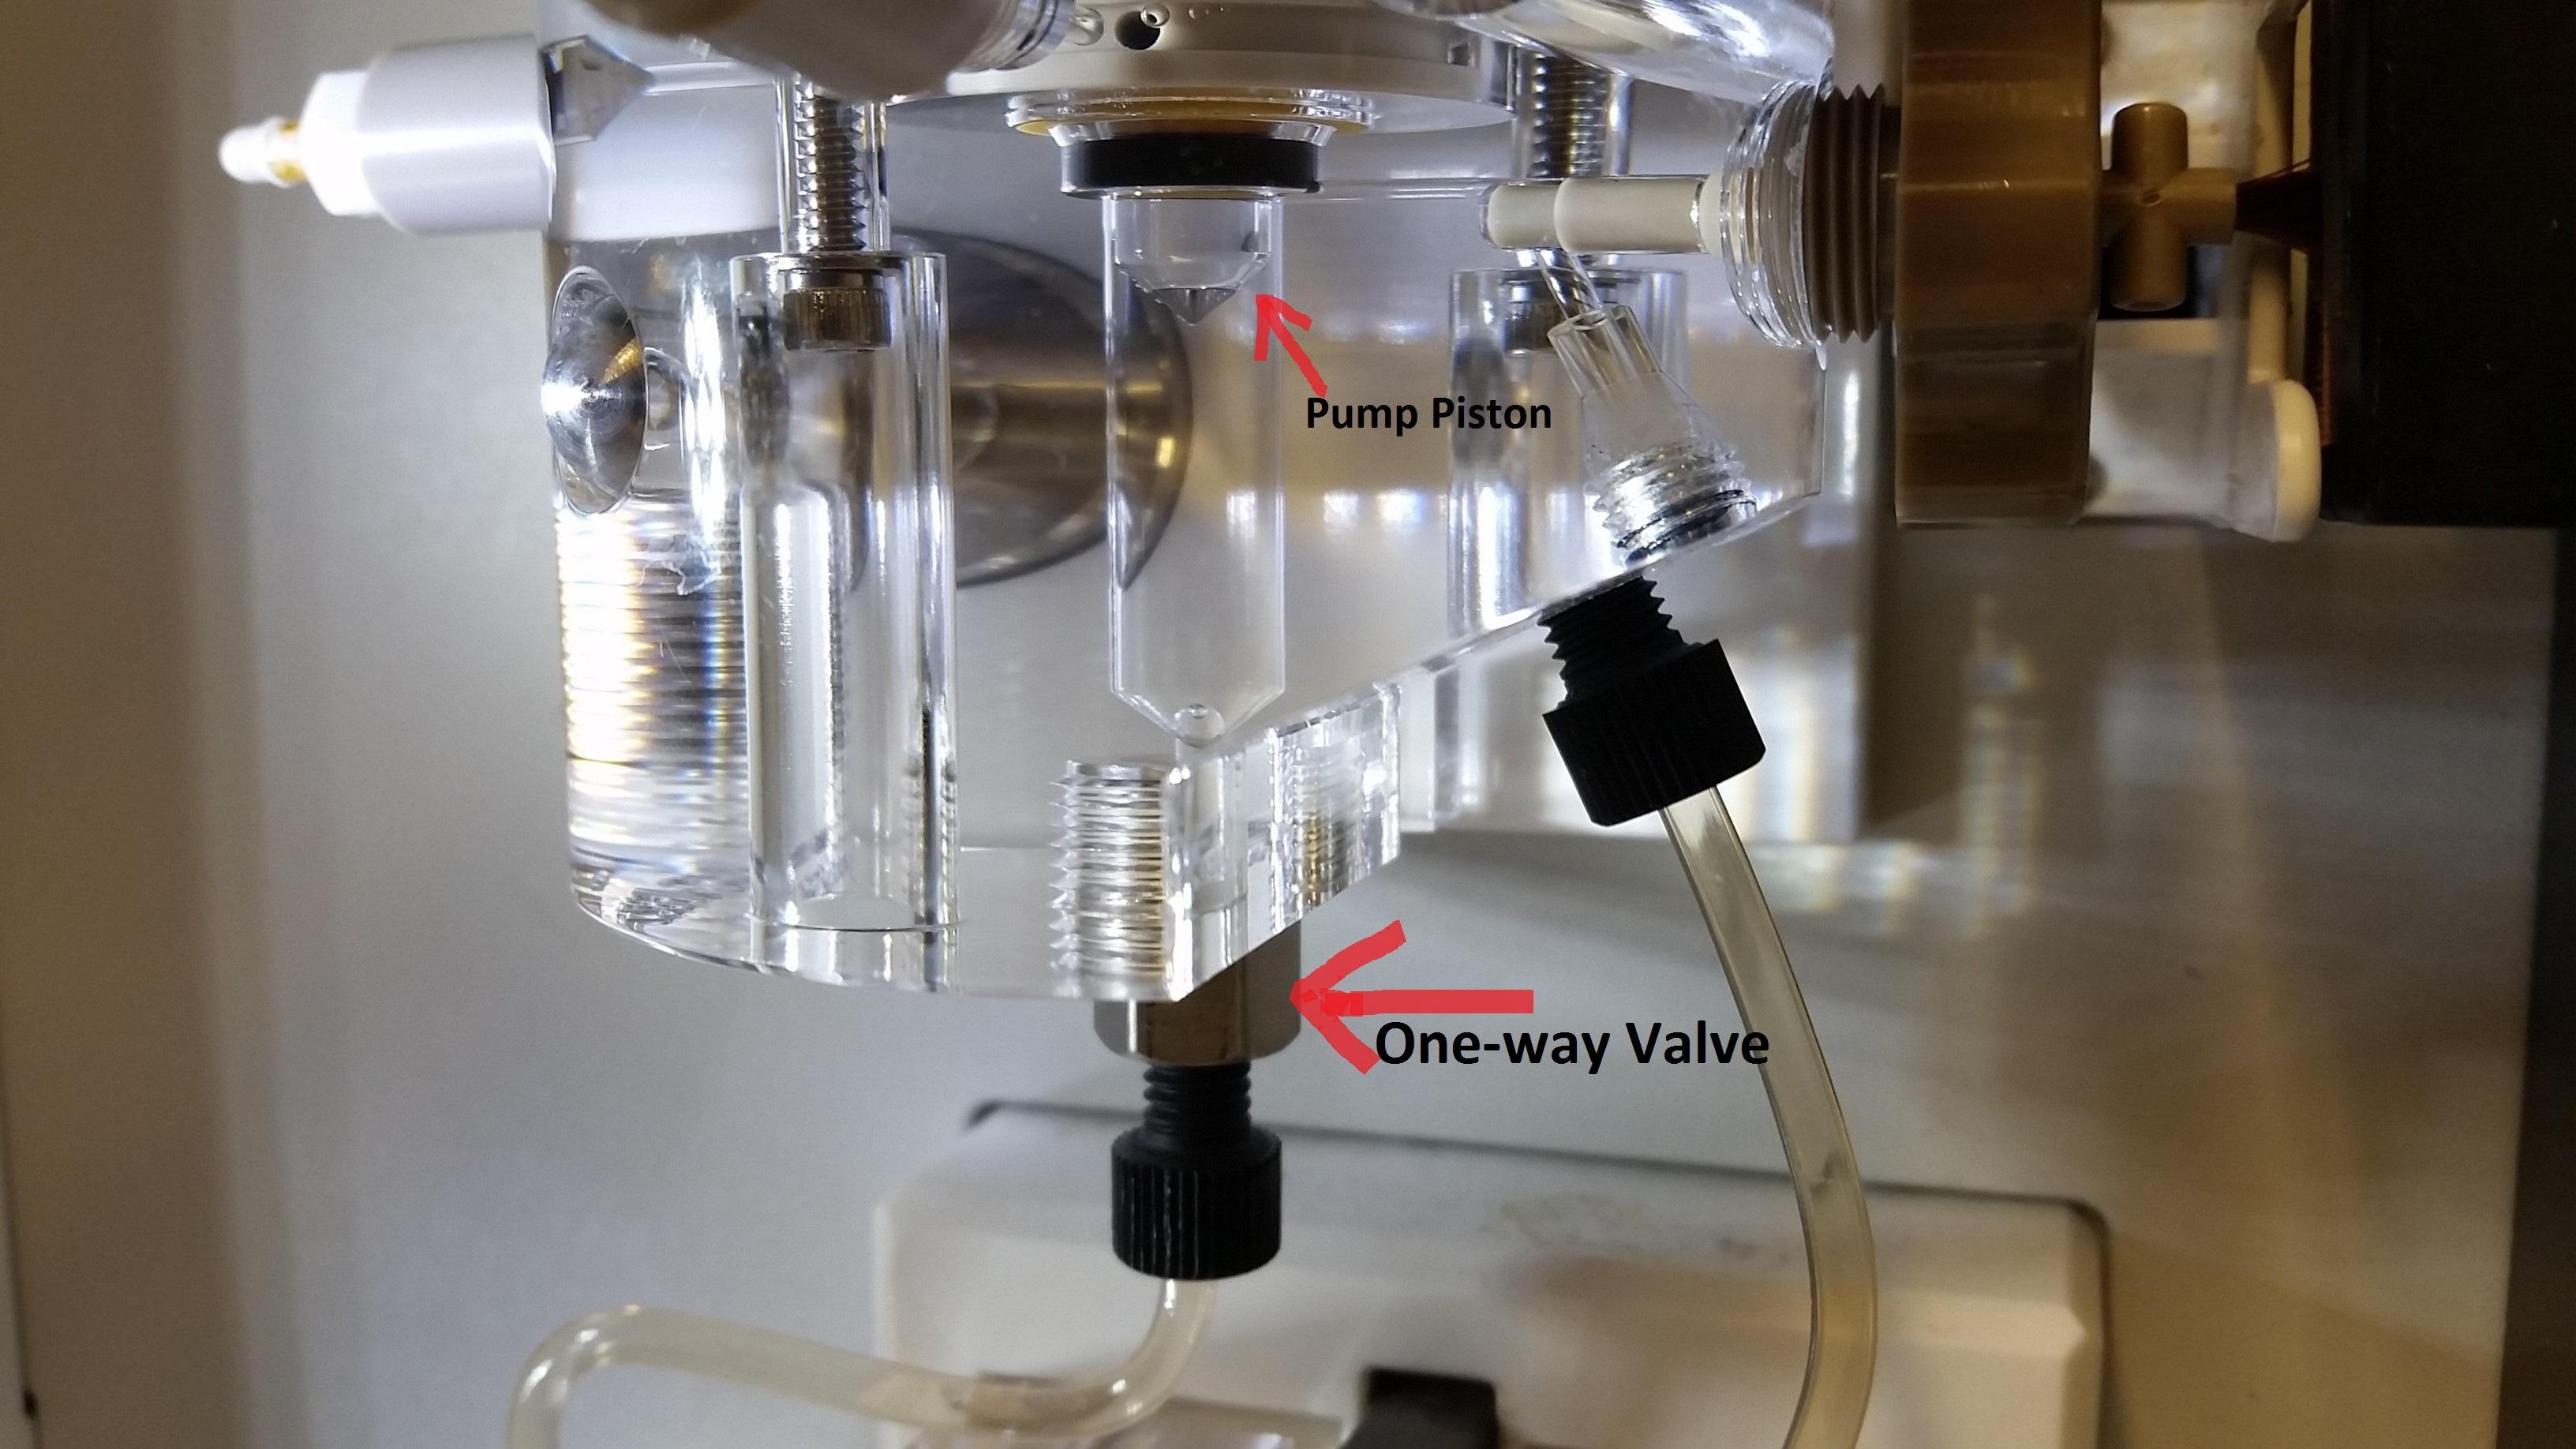 Pump_one_way_valve_pic.jpg